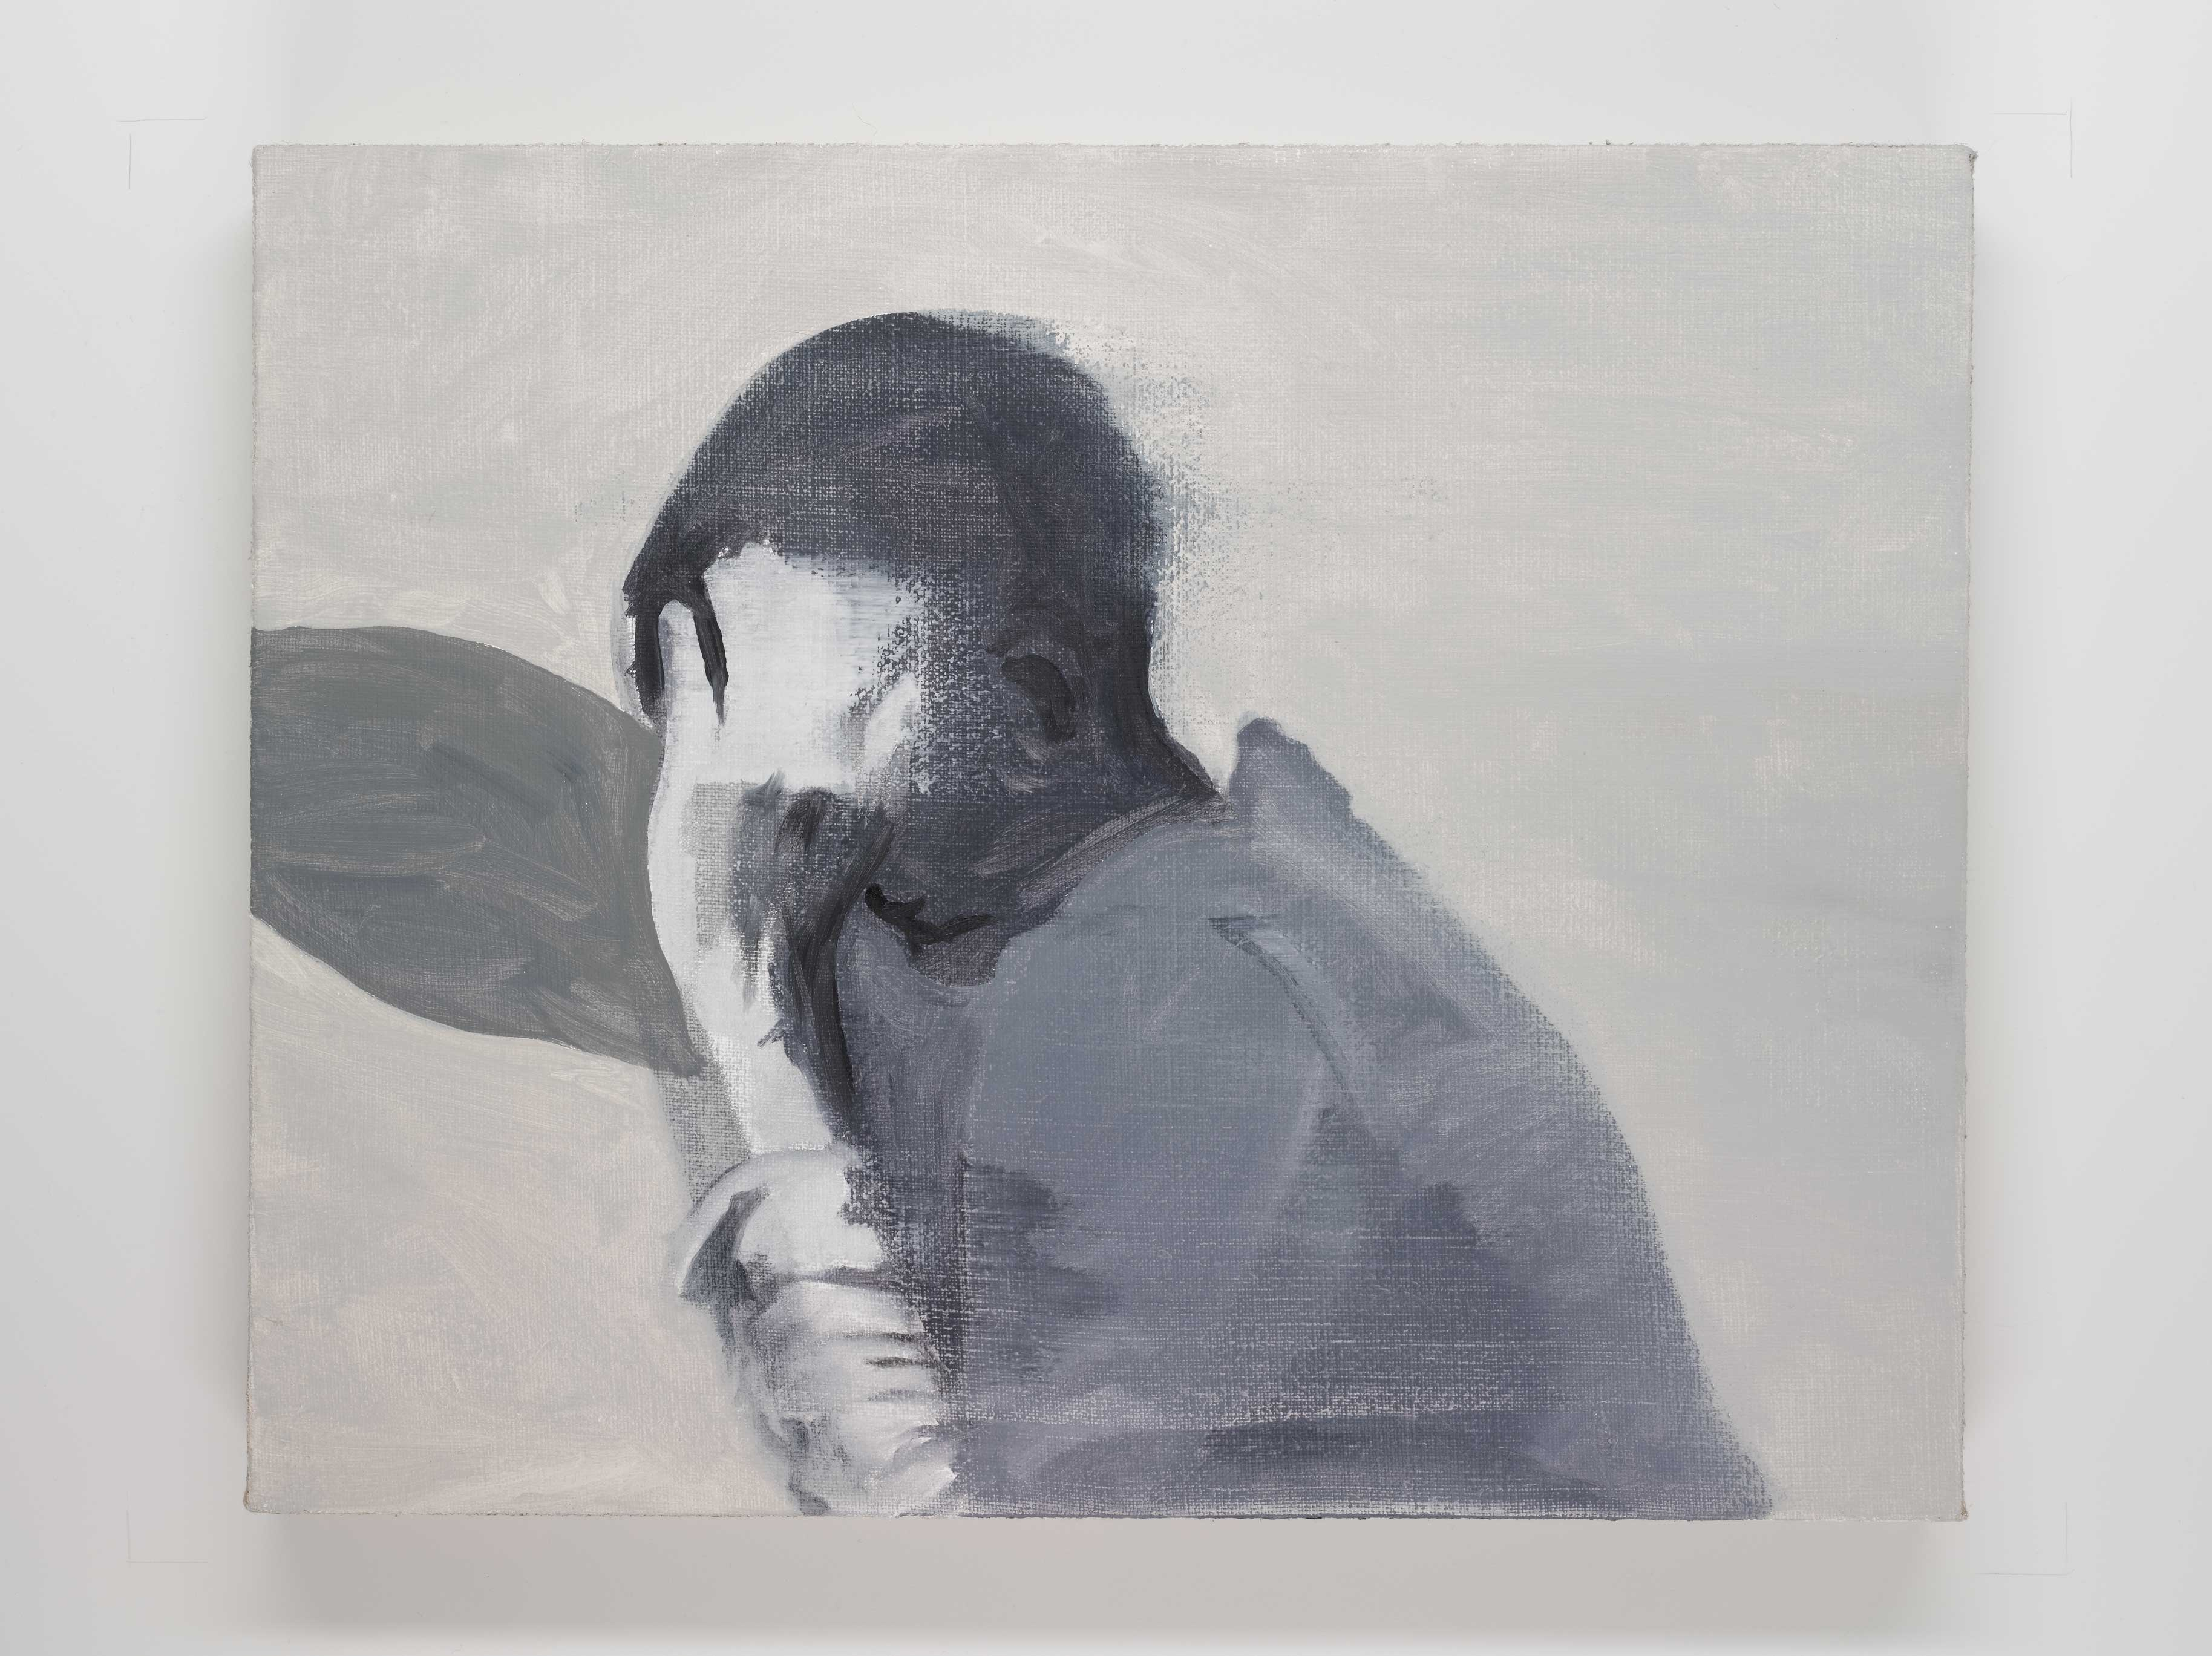 Hidden 40x50 cm oil on canvas © Austen O'Hanlon